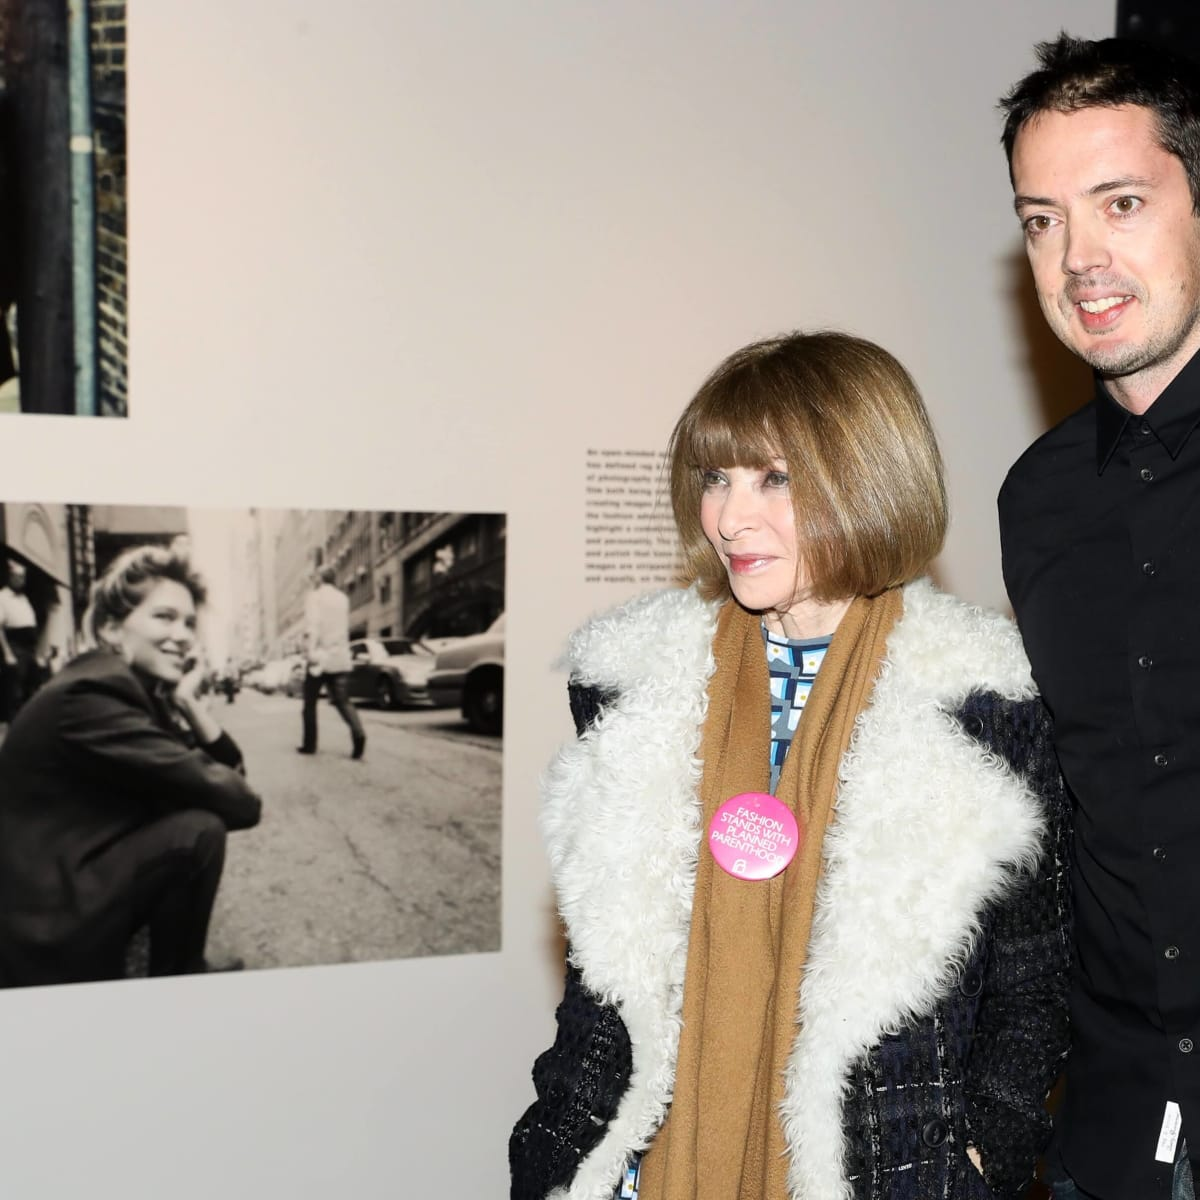 Anna Wintour, Marcus Wainwright, Rag & Bone exhibition, party